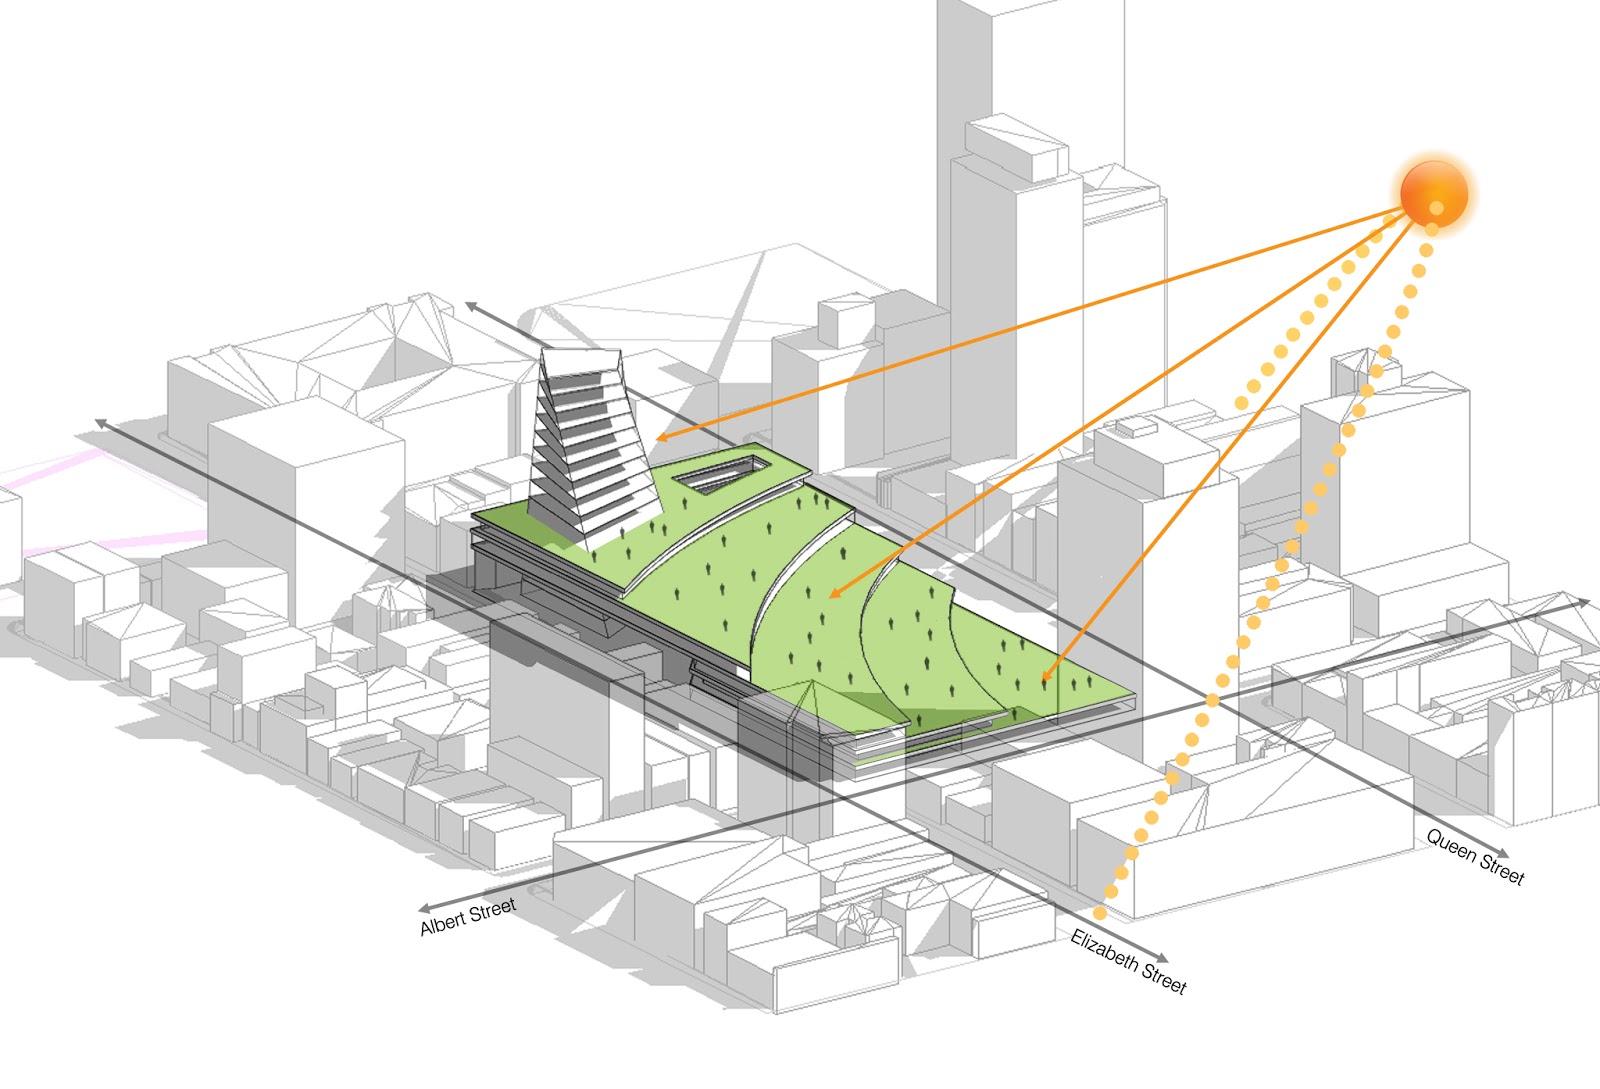 Sun path diagram dab810 studio blog for Terrace farming diagram